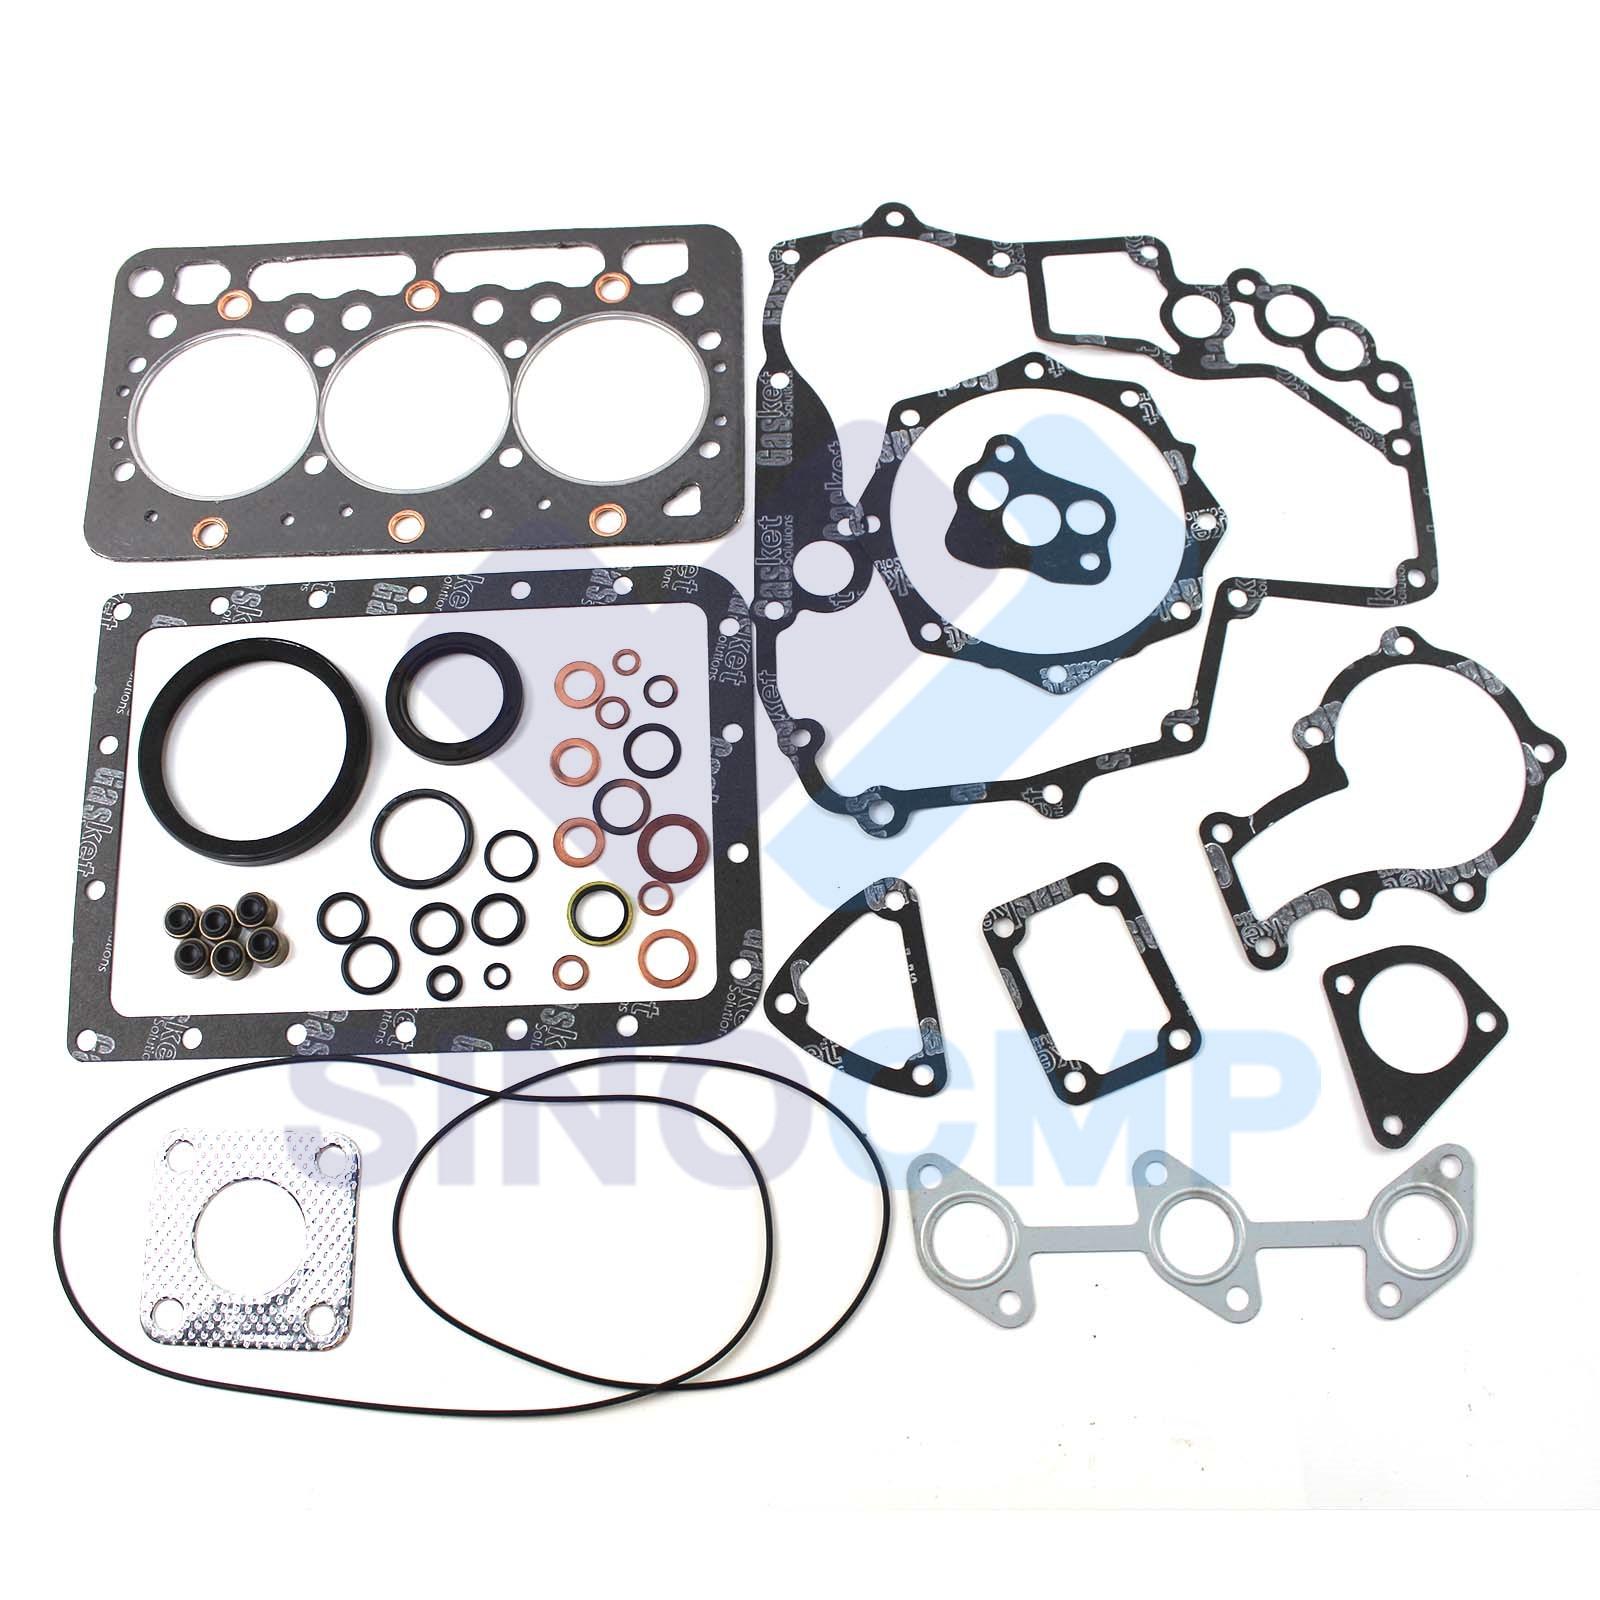 4hf1 junta do motor kit para nkr npr 4.3l diesel wpn400 nkr66 caminhão